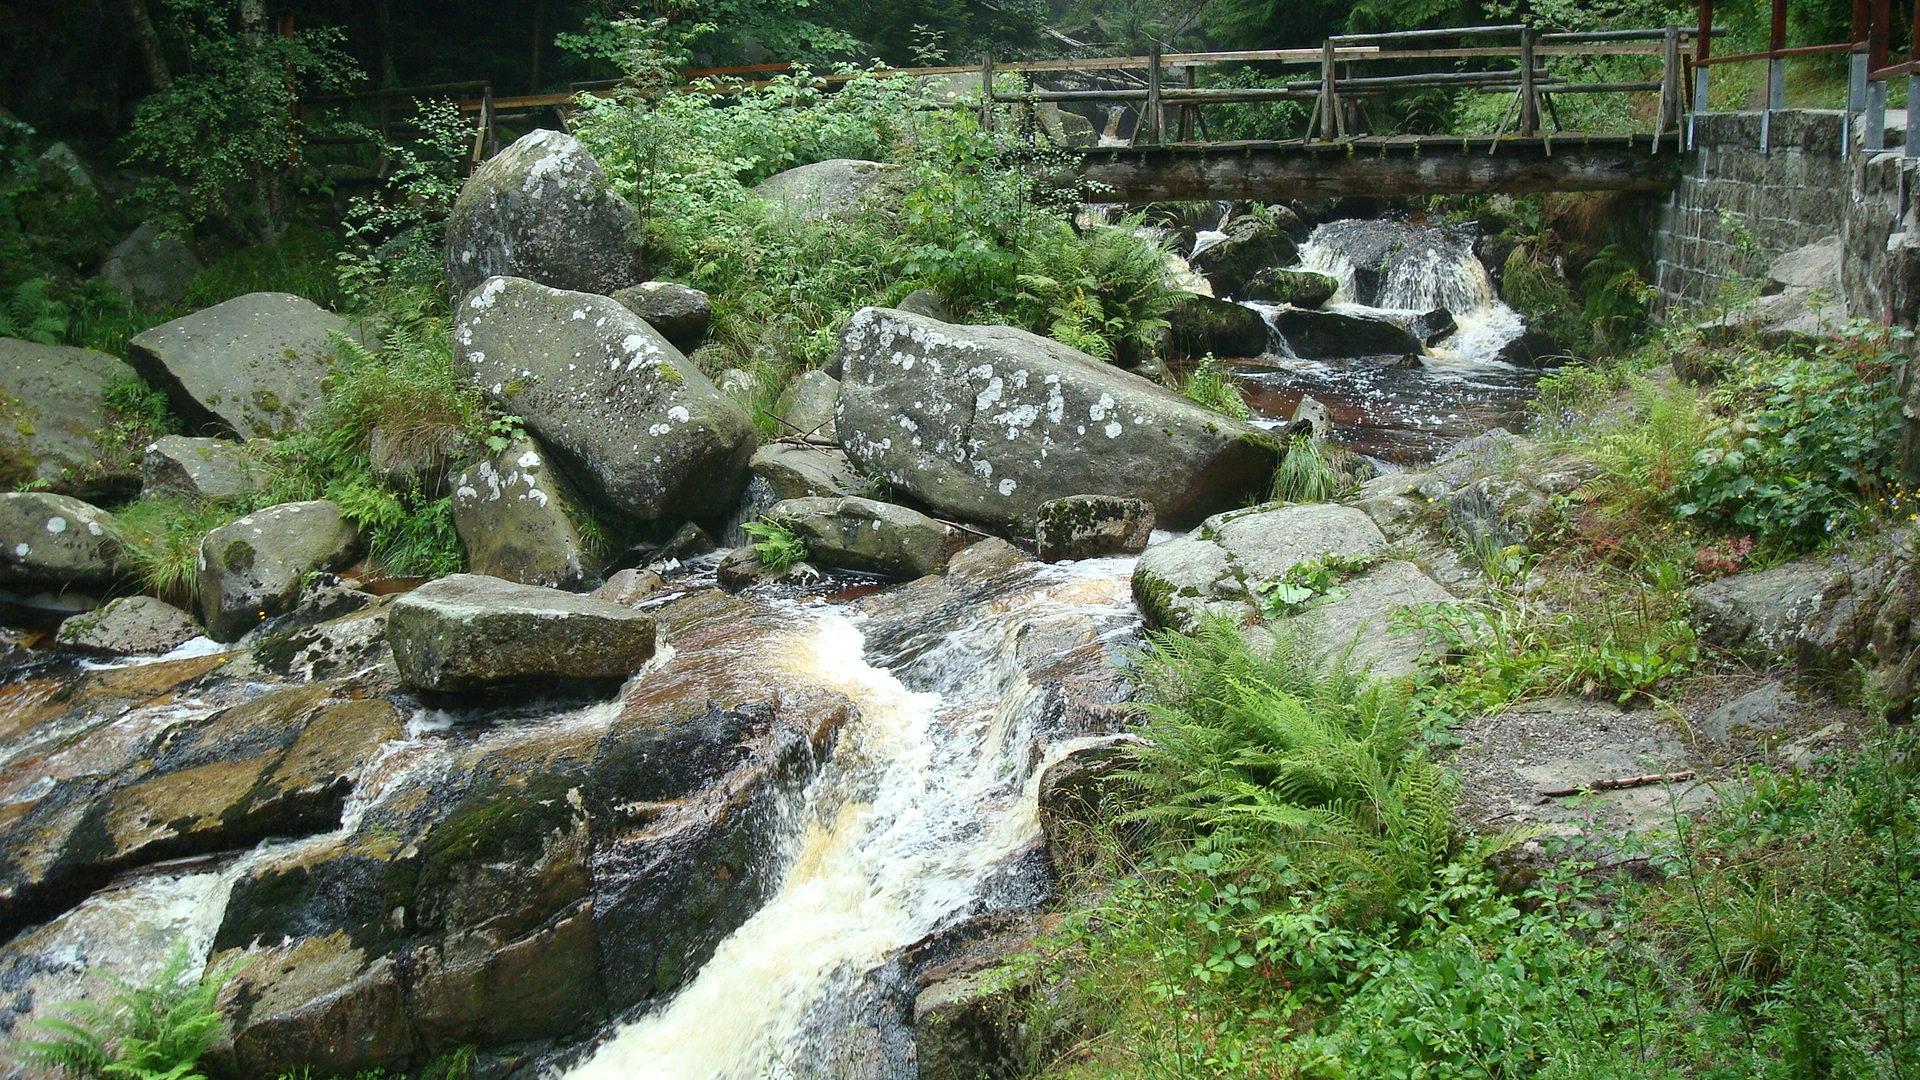 Water Nature Rock Waterfall Creek Pond Stream Garden Body Of Water Trees  Vegetation Rainforest Mood Resin